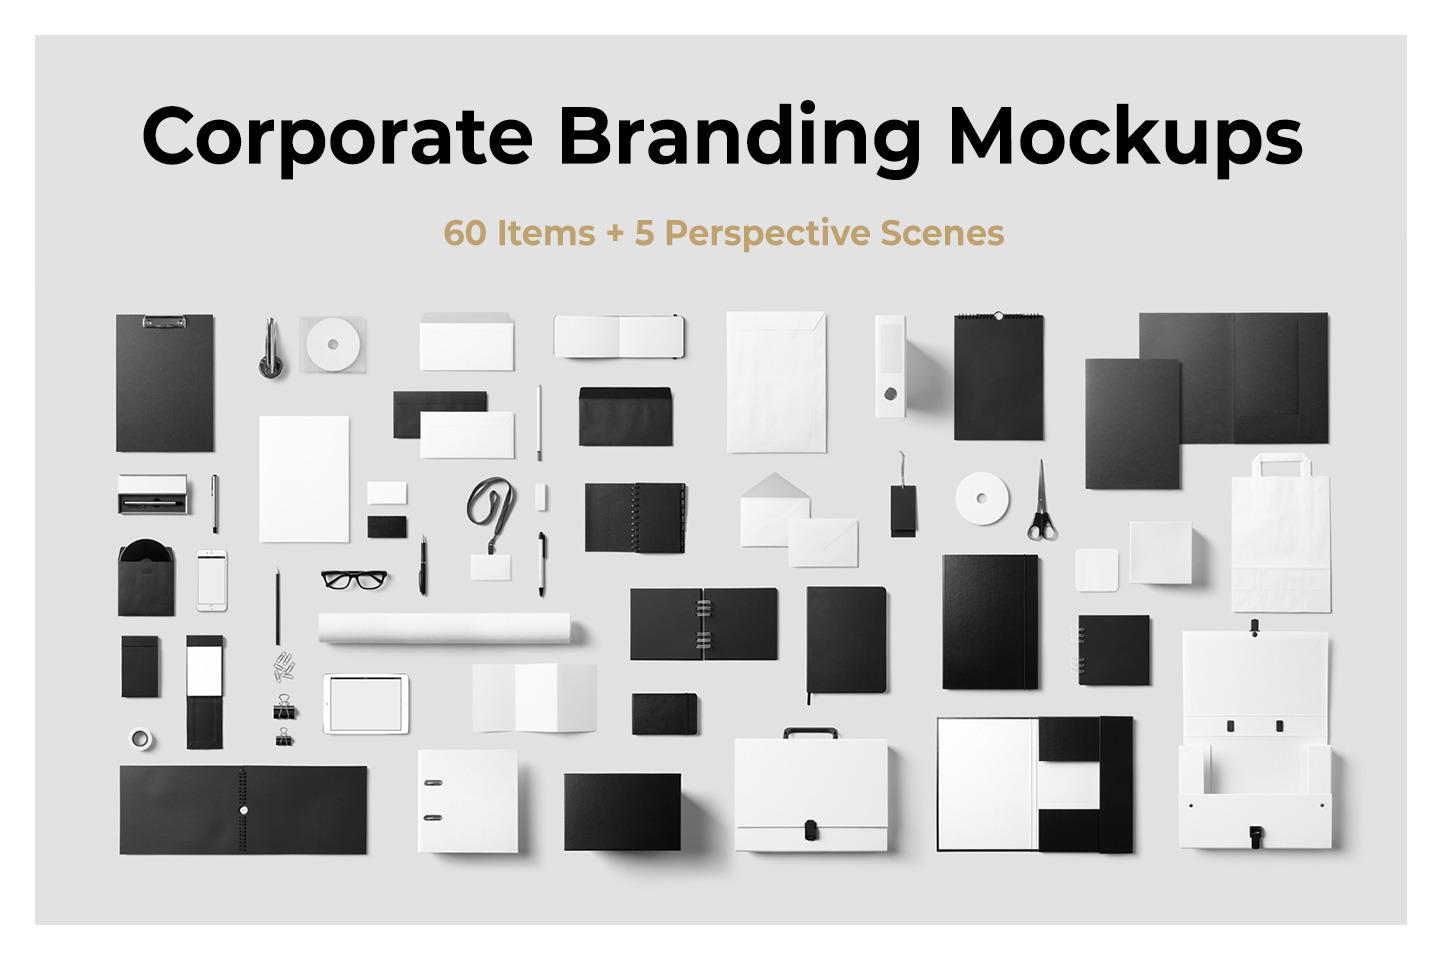 Corporate Branding Mockups